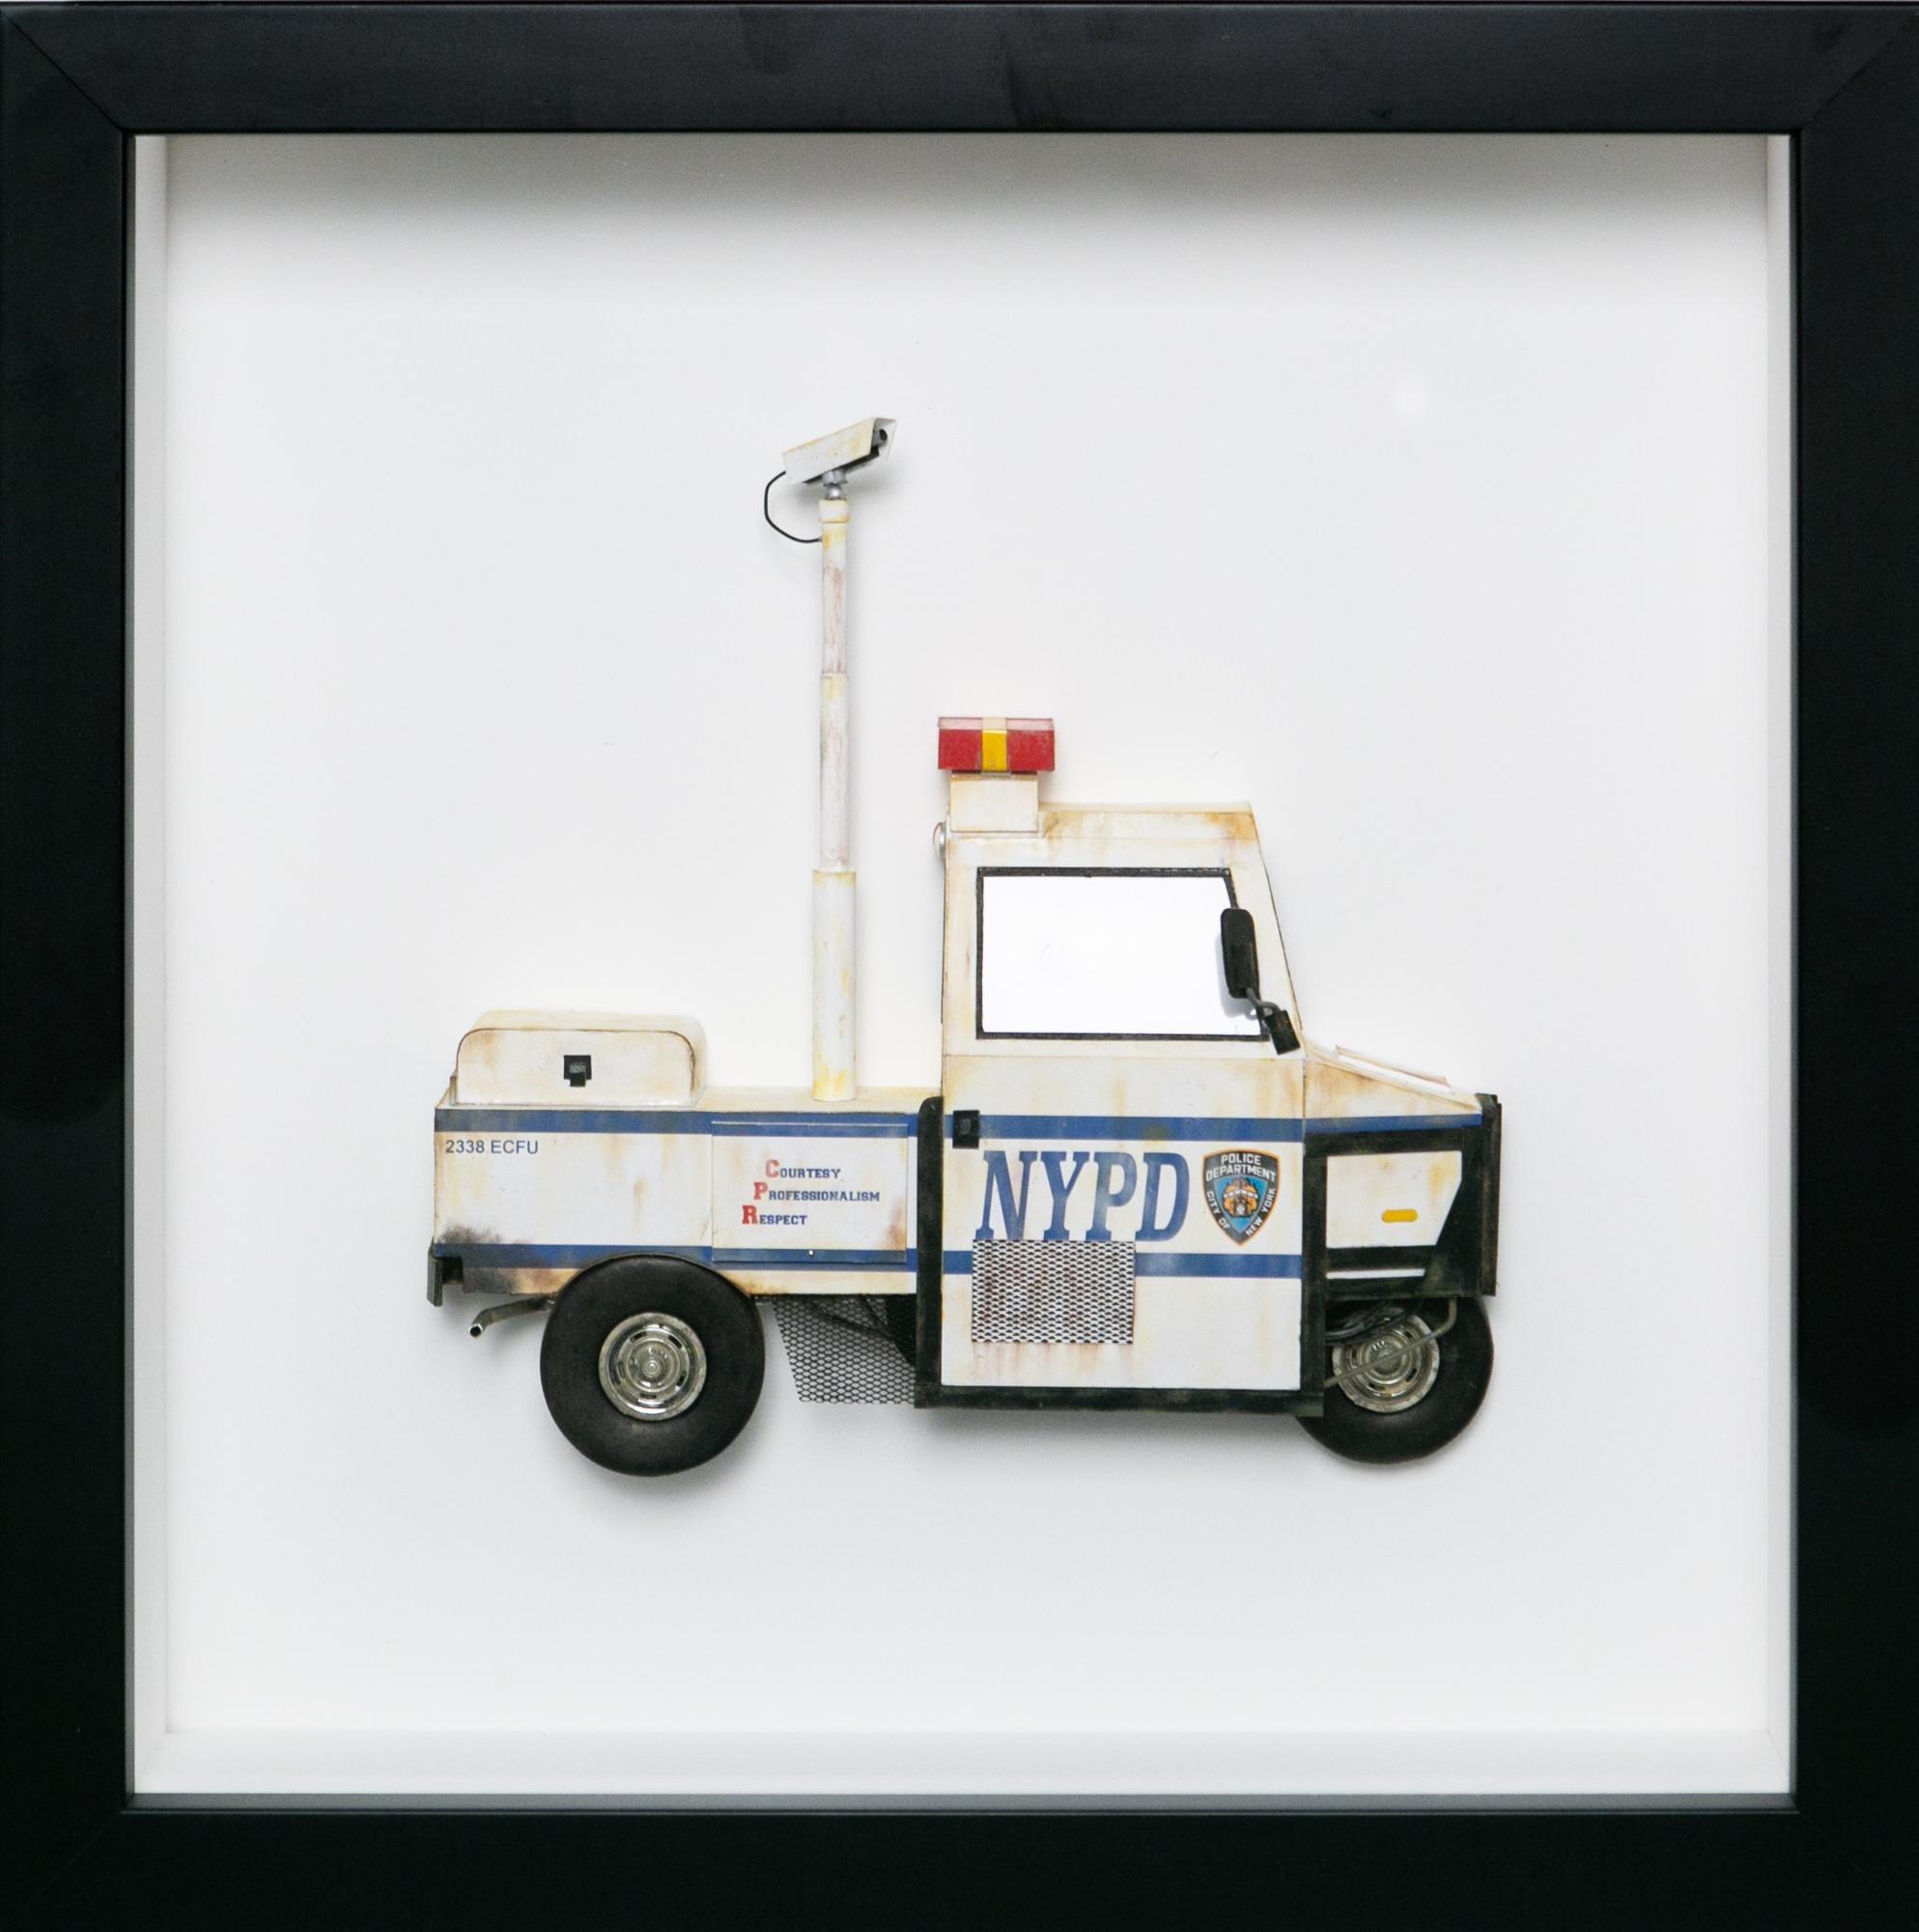 NYPD Interceptor